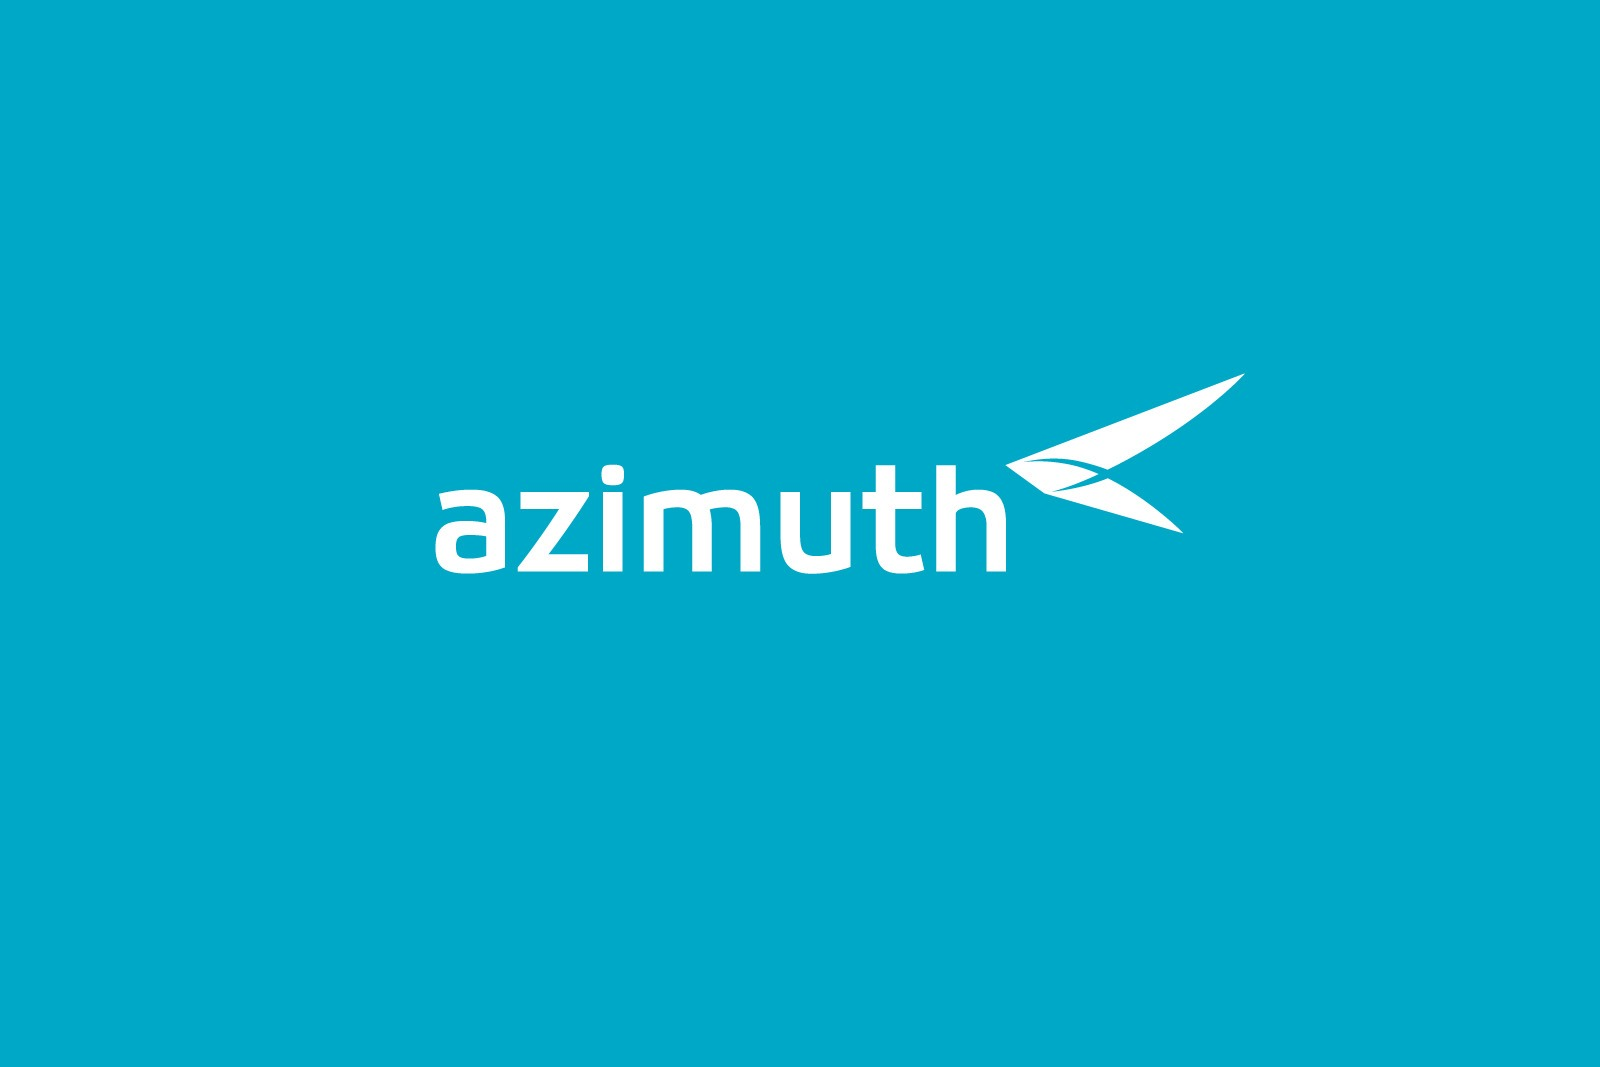 Авиакомпания Азимут, логотип на голубом, Azimuth Airline logo